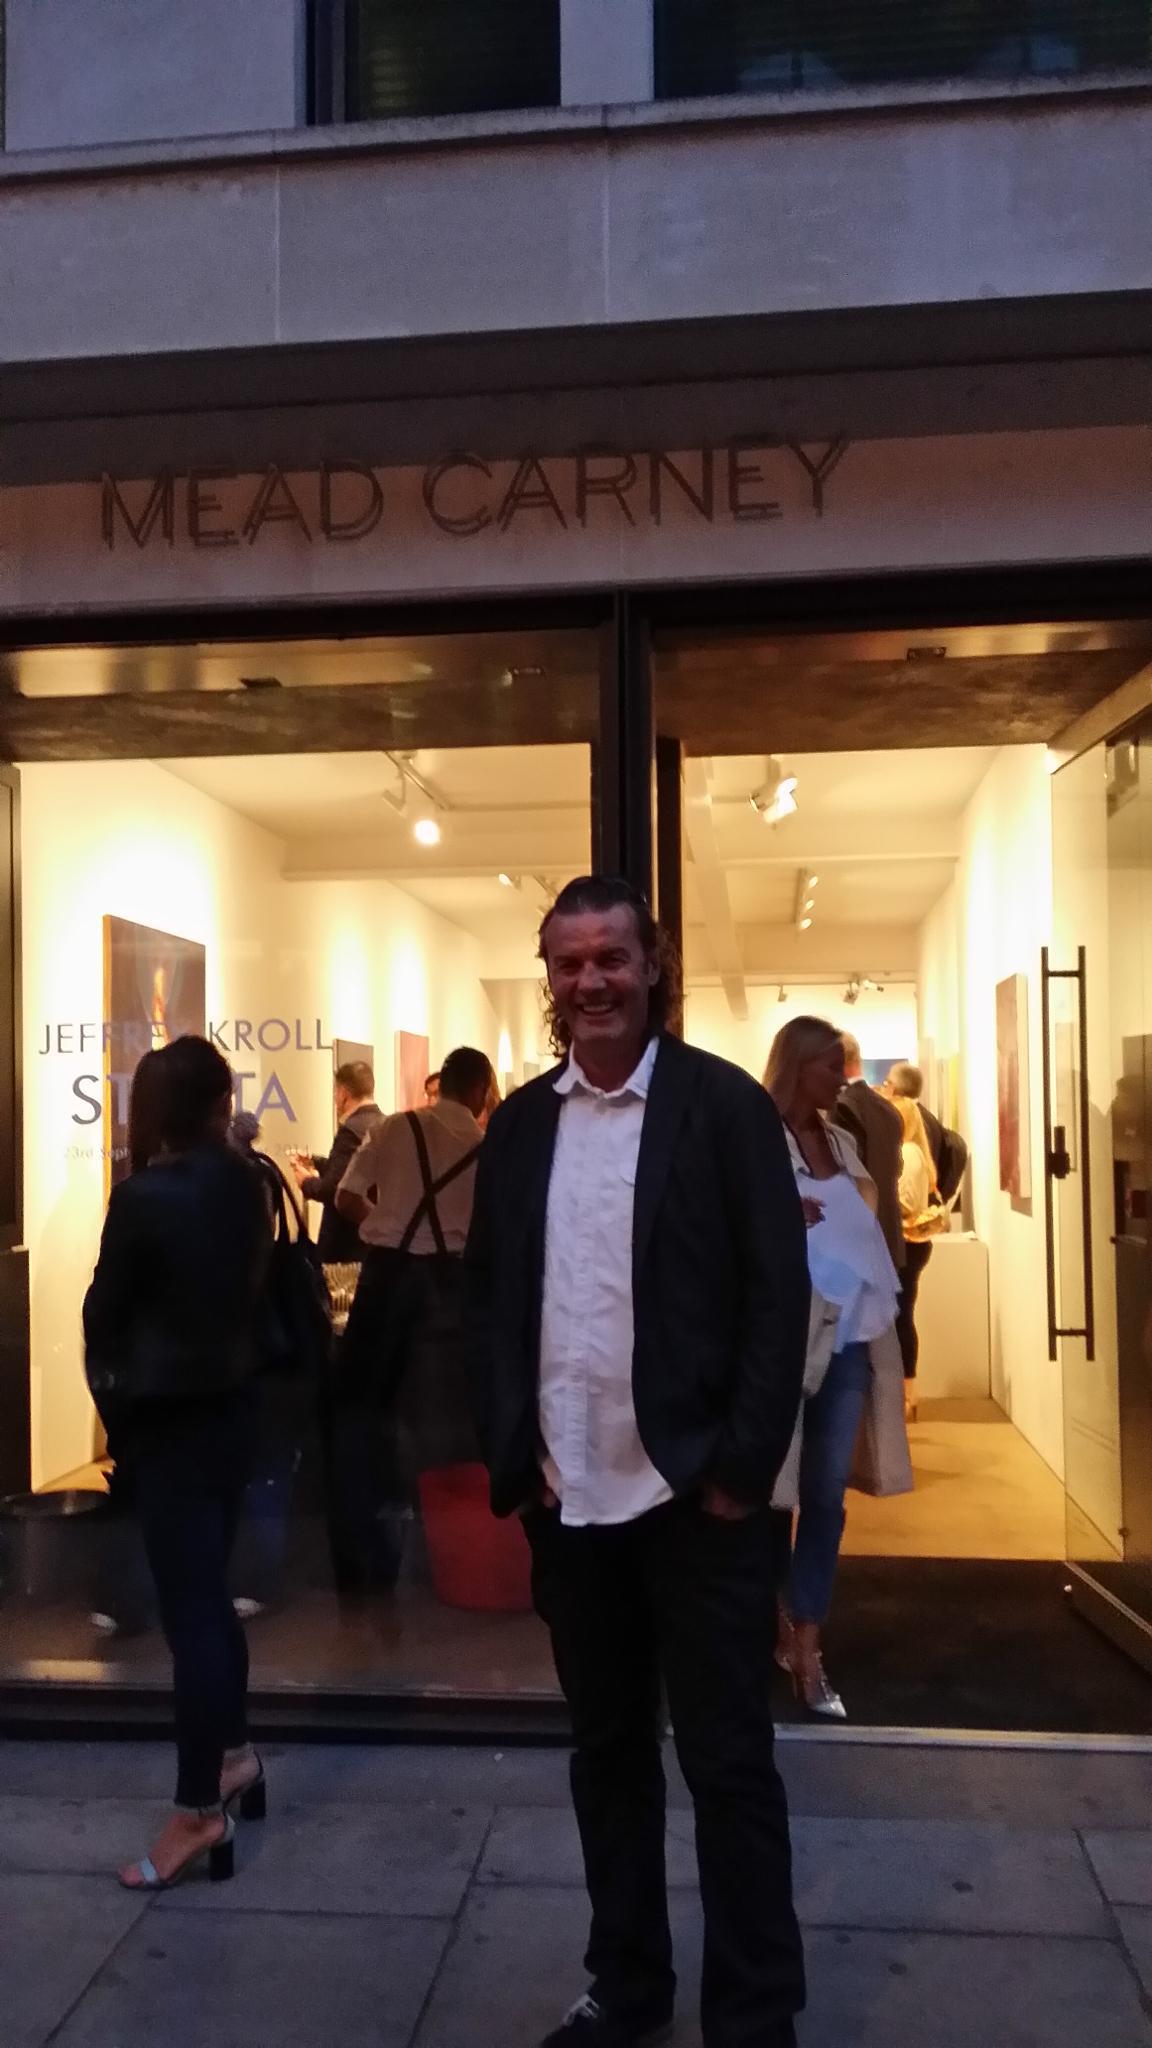 Mead carney gallery London by Janez Štros